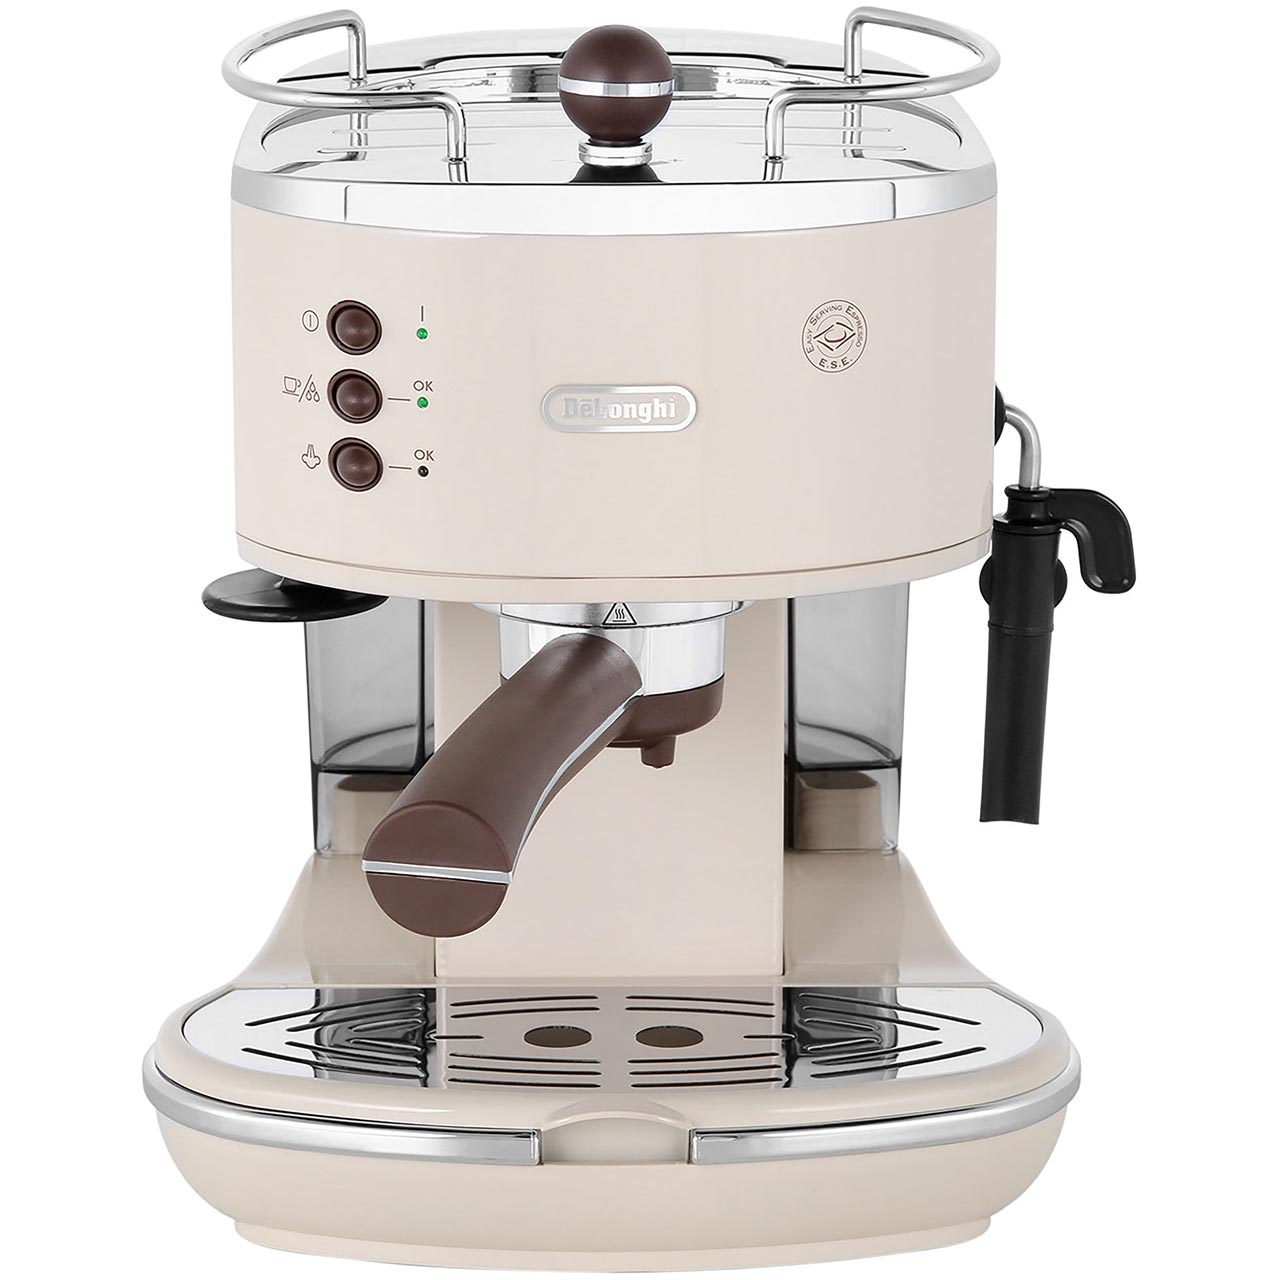 Delonghi Icona Vintage Ecov311bg Espresso Coffee Machine Cream